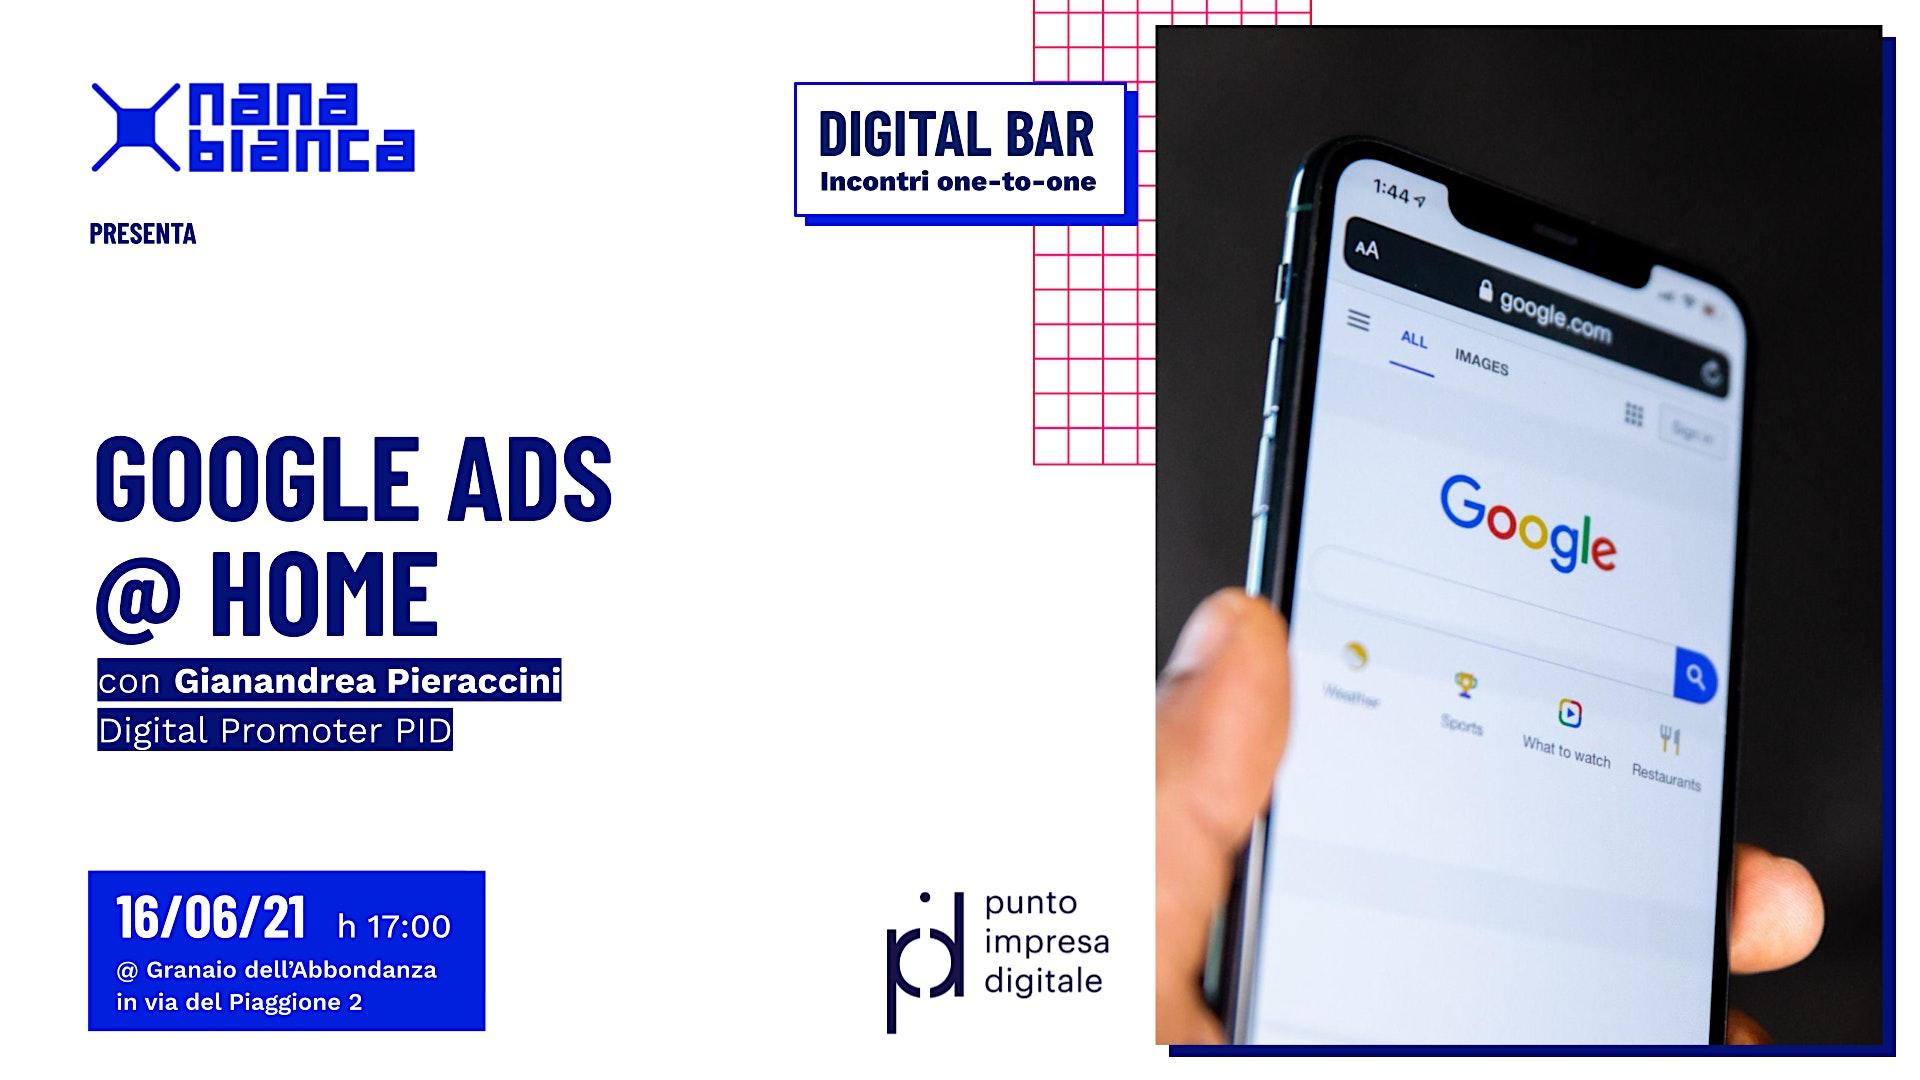 Digital Bar: Google Ads @ Home